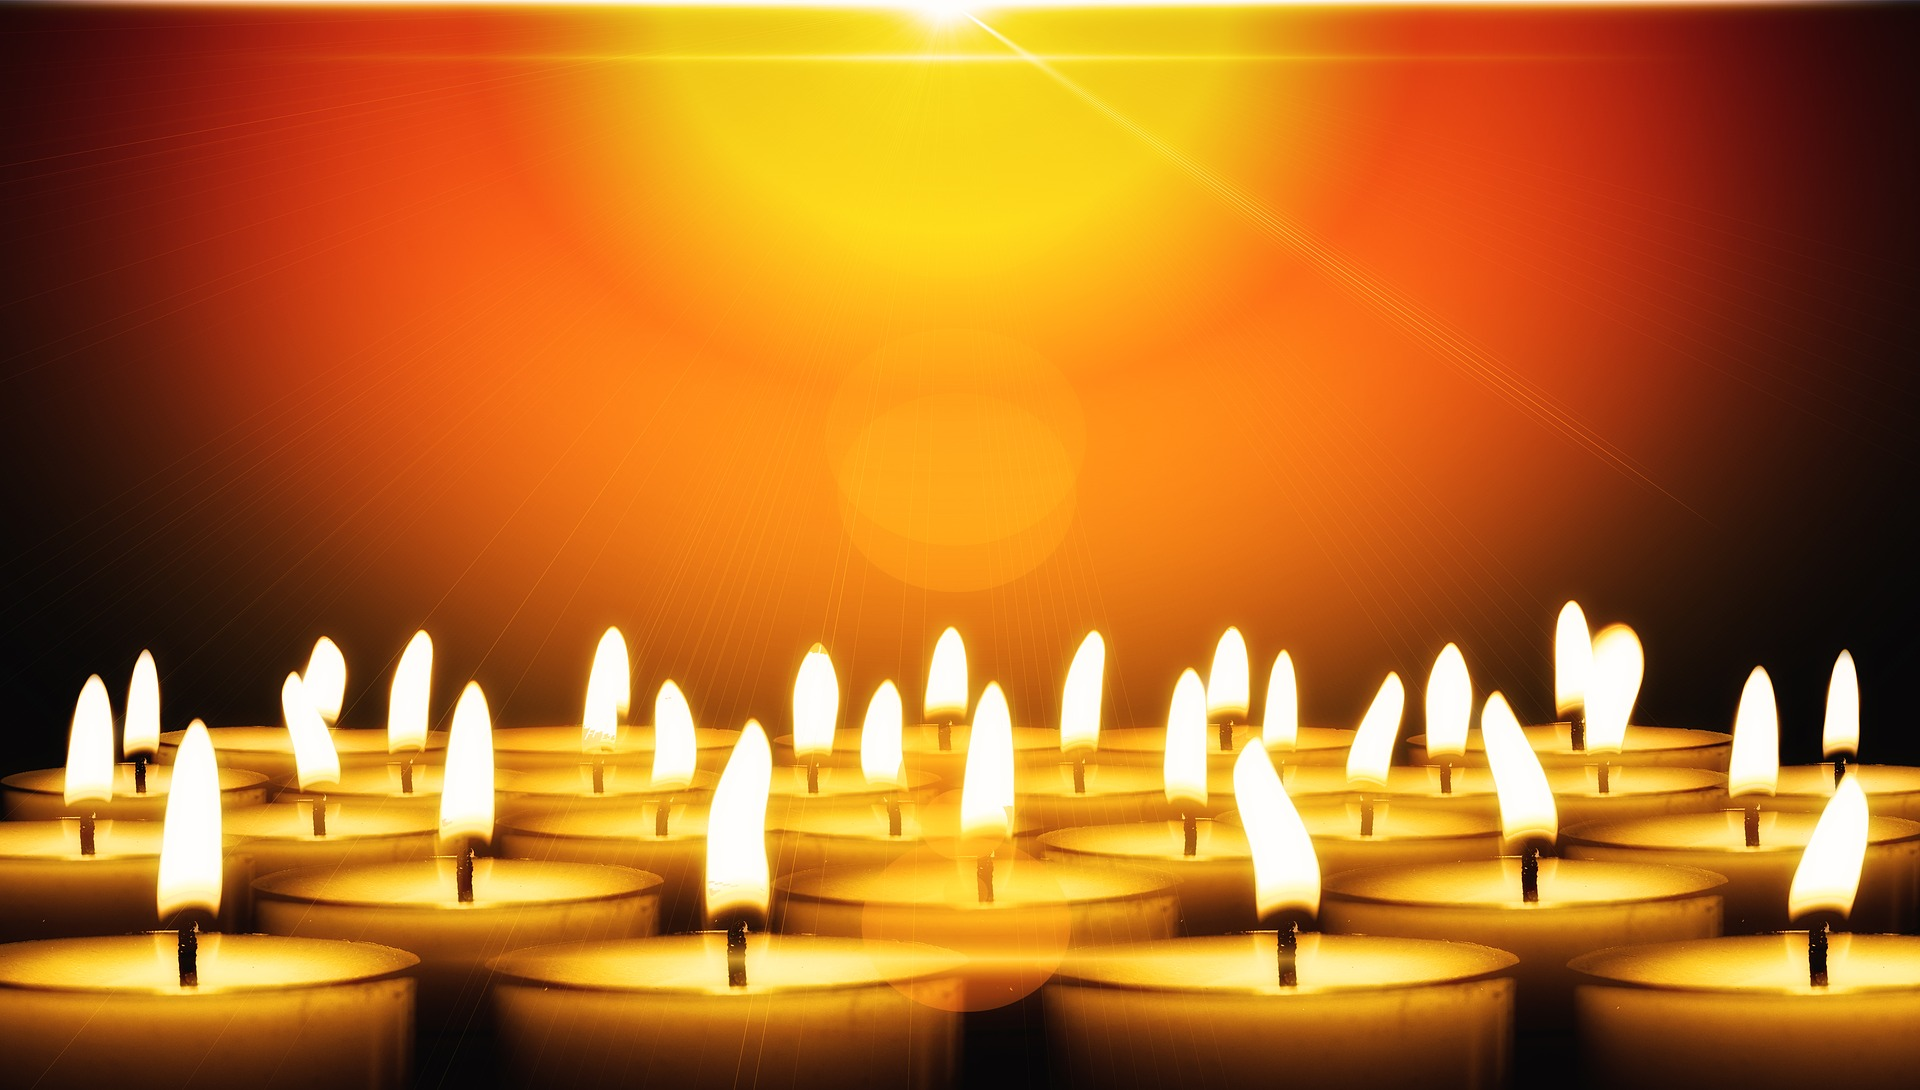 candles-2877148_1920.jpg